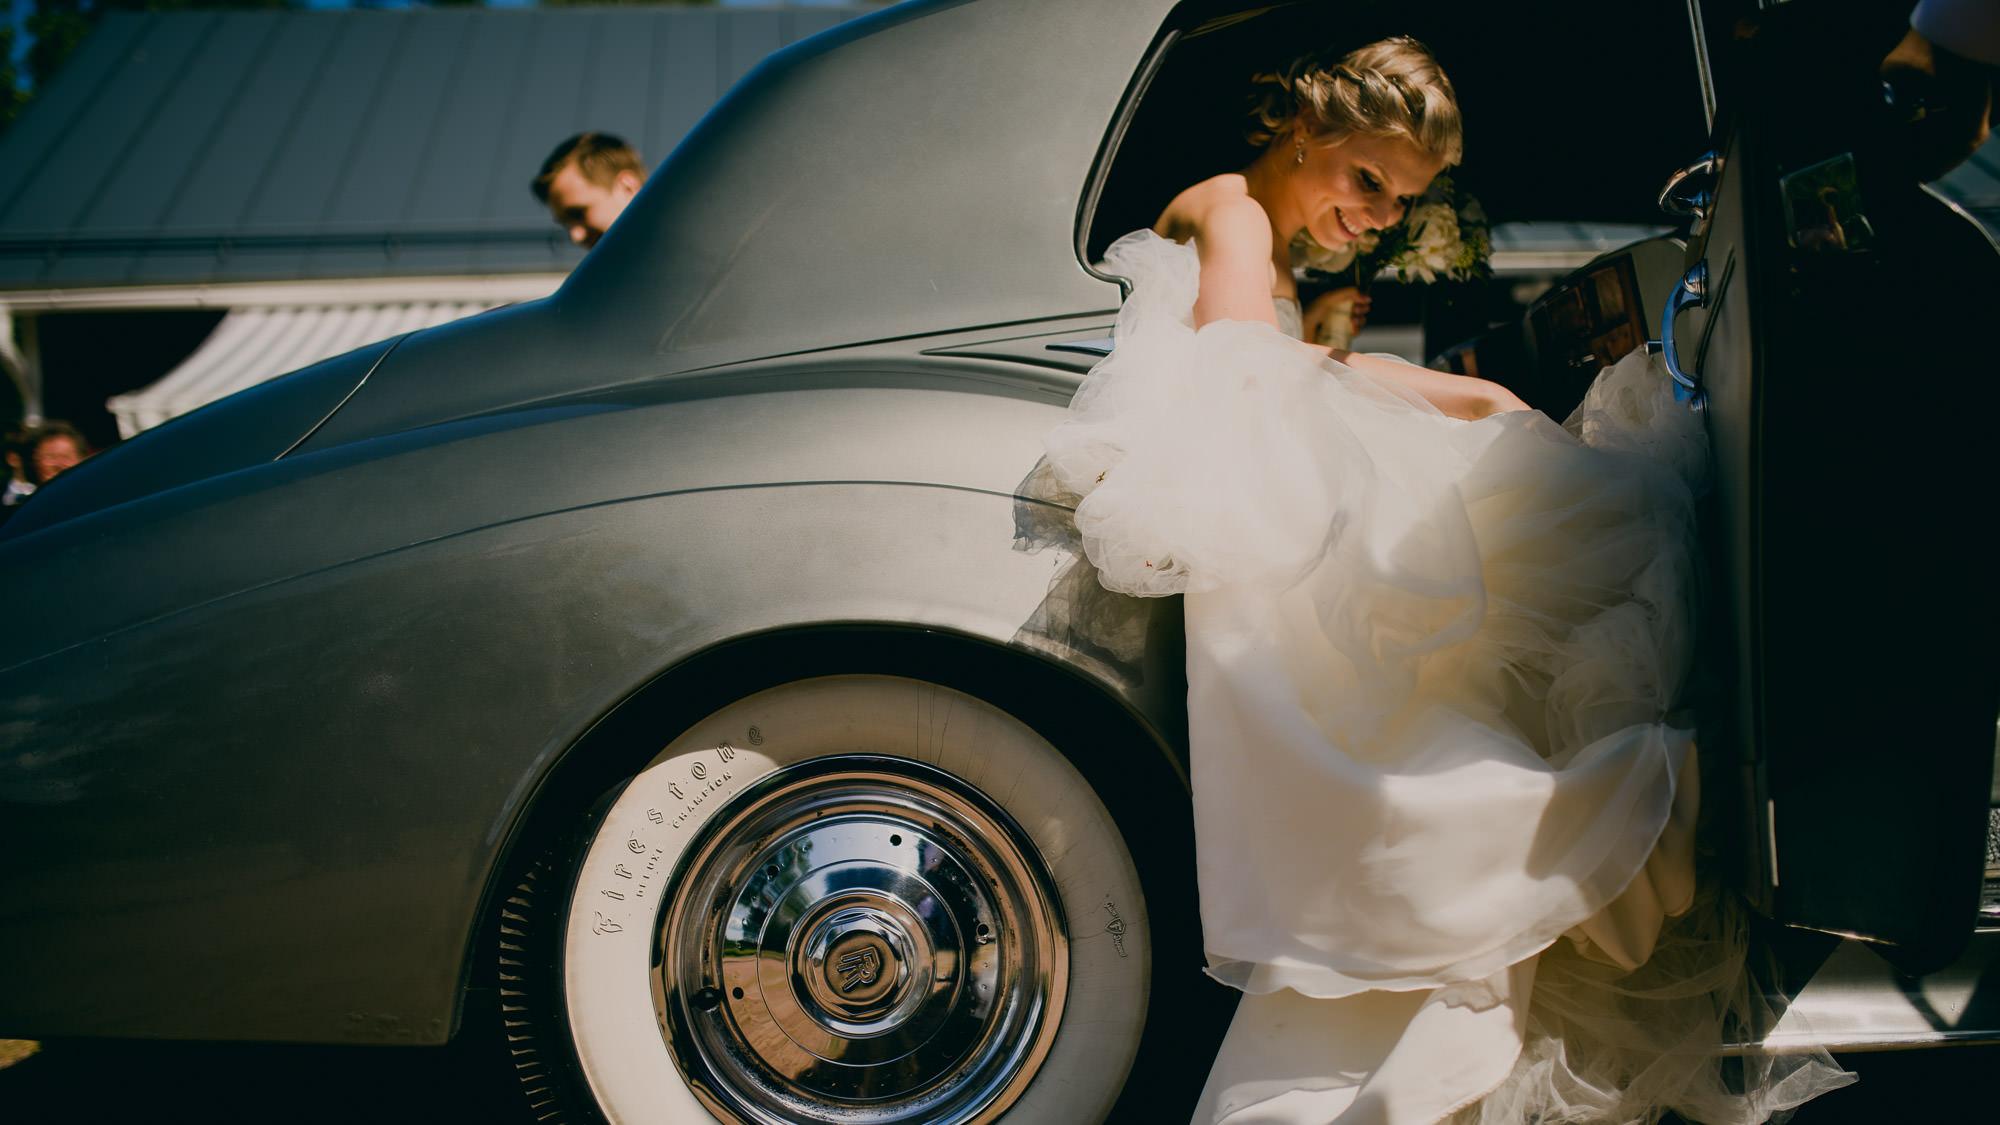 rabbit_visuals_haavideo_wedding_videography_el-014.jpg